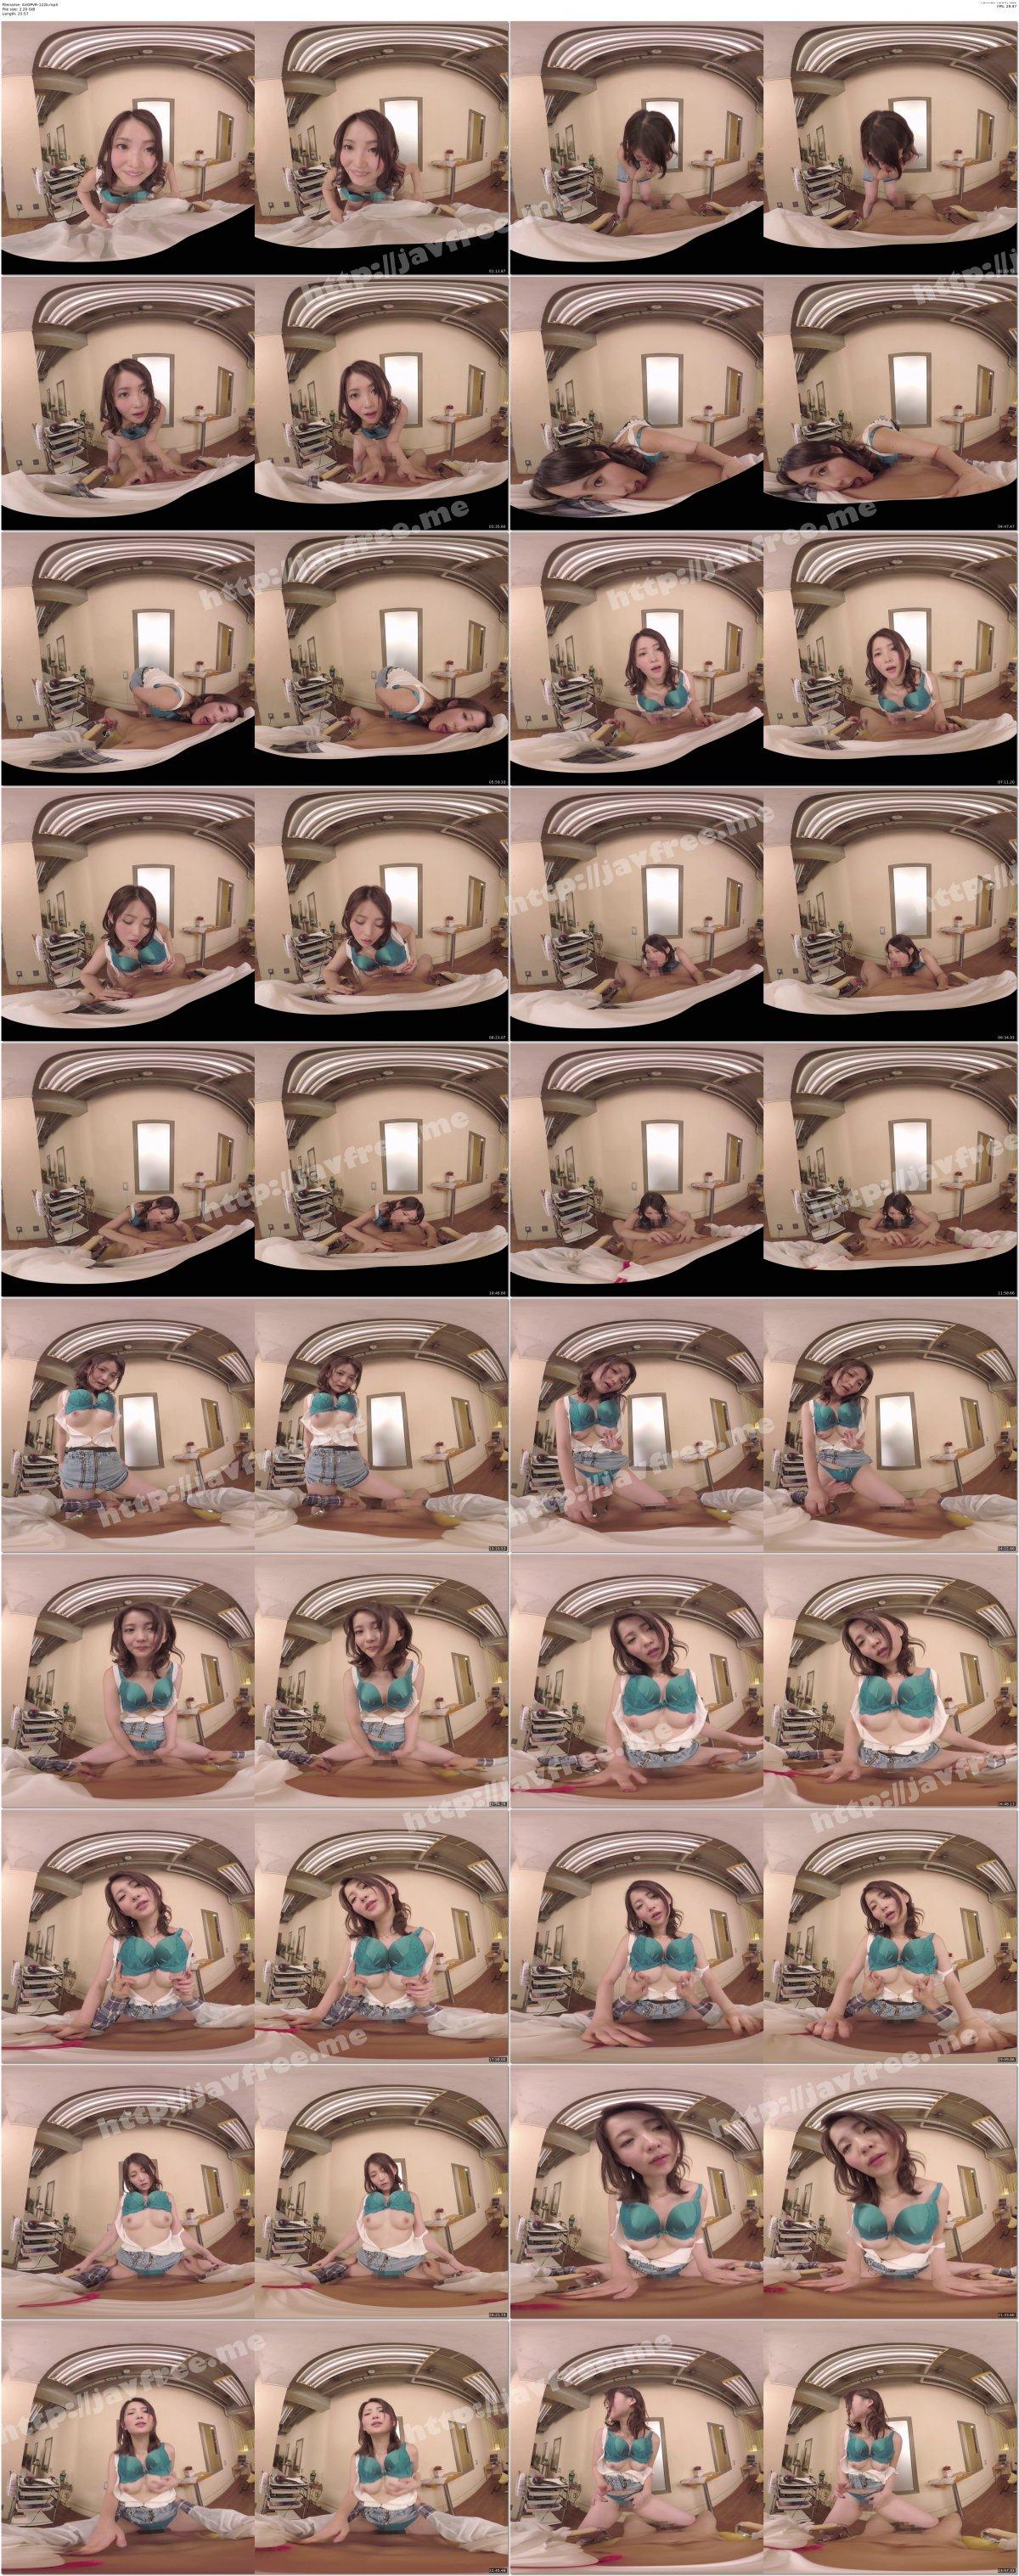 [AVOPVR-122] 【VR】働く女に誘惑されて 美容室編・アパレルショップ編・居酒屋編